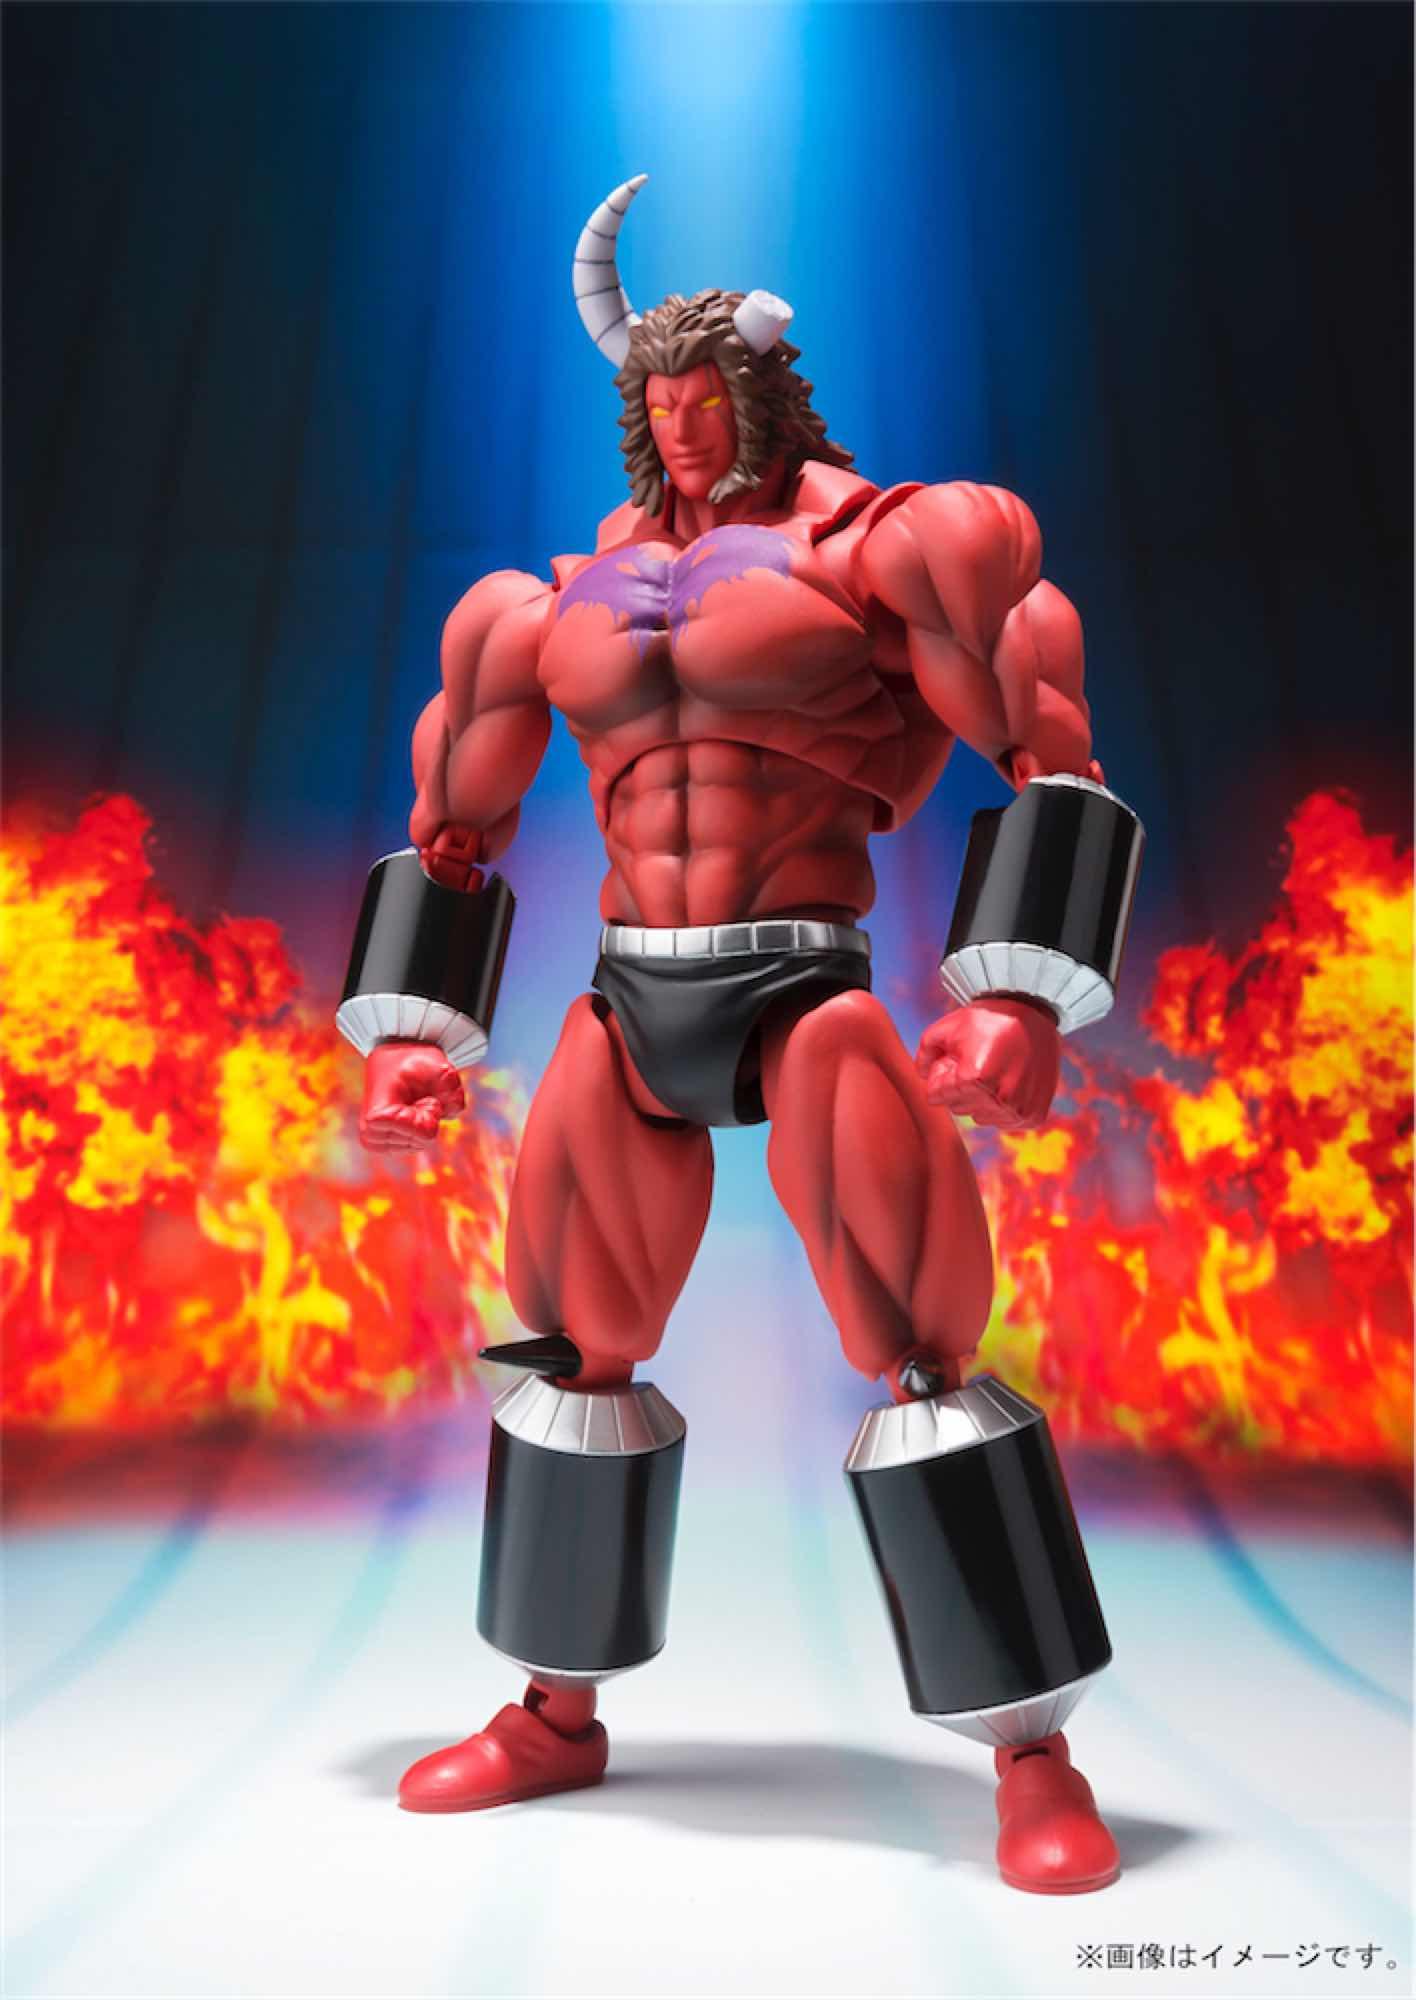 BUFFALO MAN 10 MILLION POWER VER. OCE FIGURA 17 CM KINNIKUMAN SH FIGUARTS